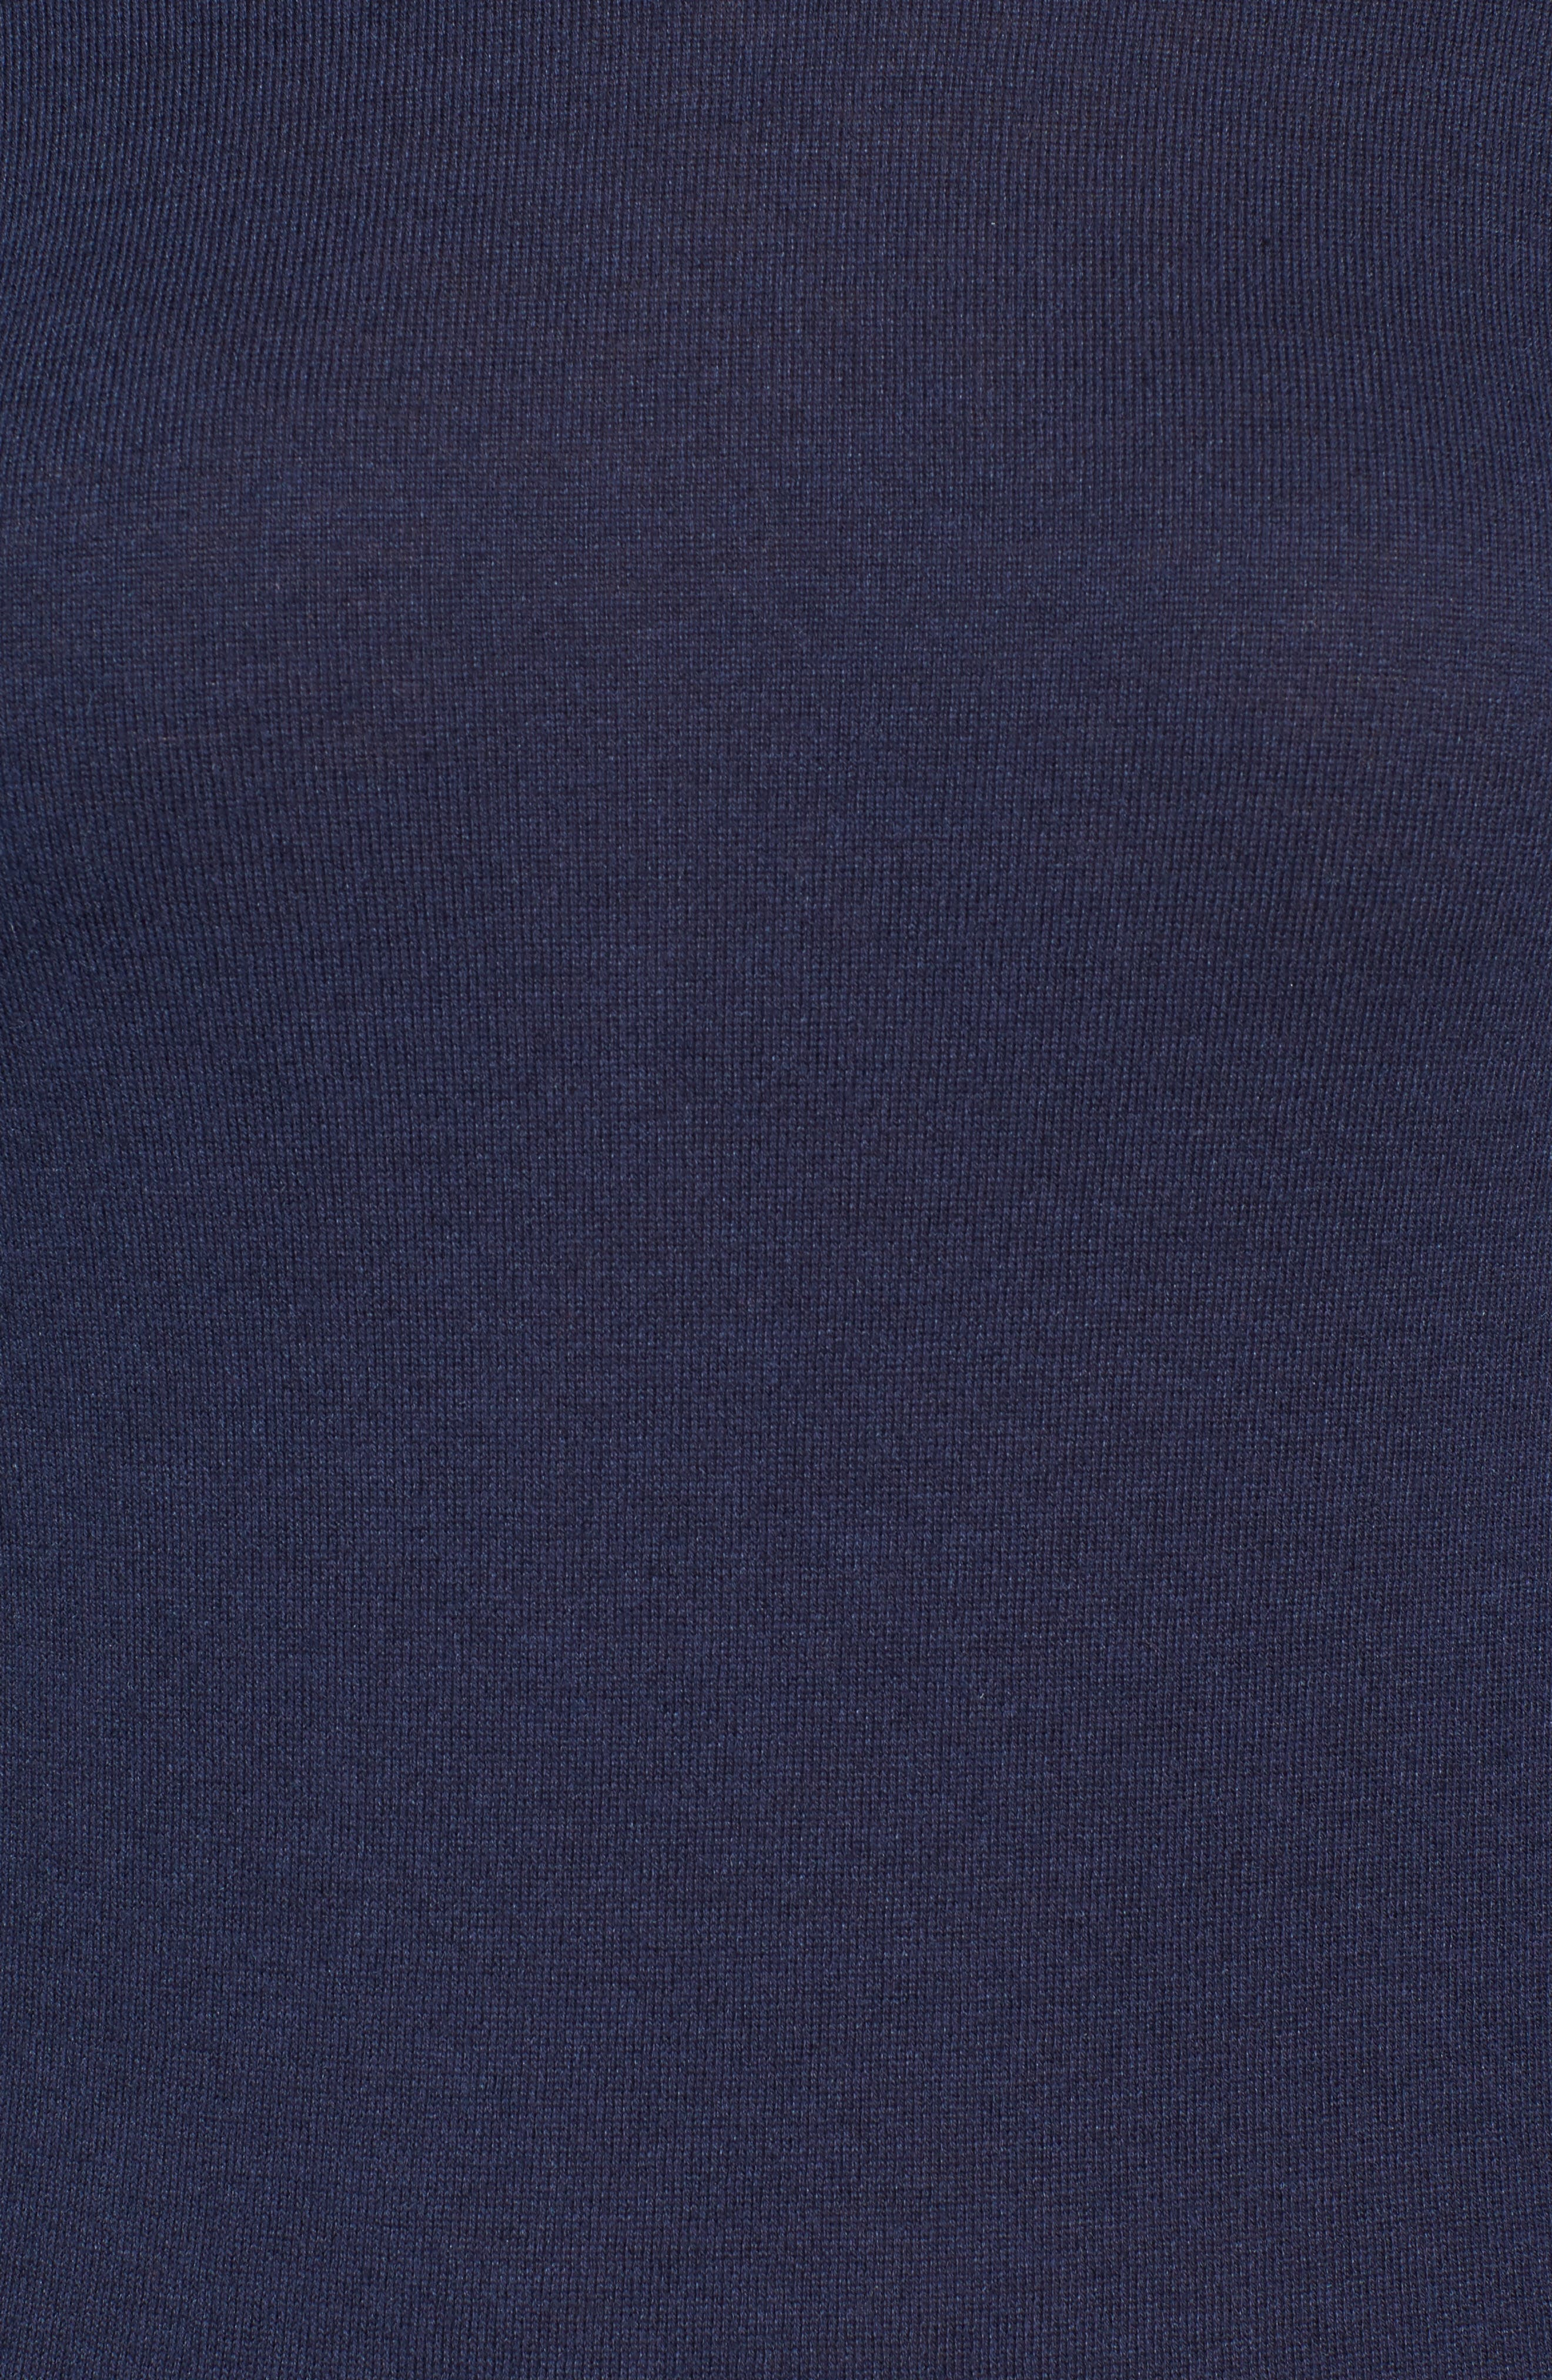 Cotton Blend Pullover,                             Alternate thumbnail 136, color,